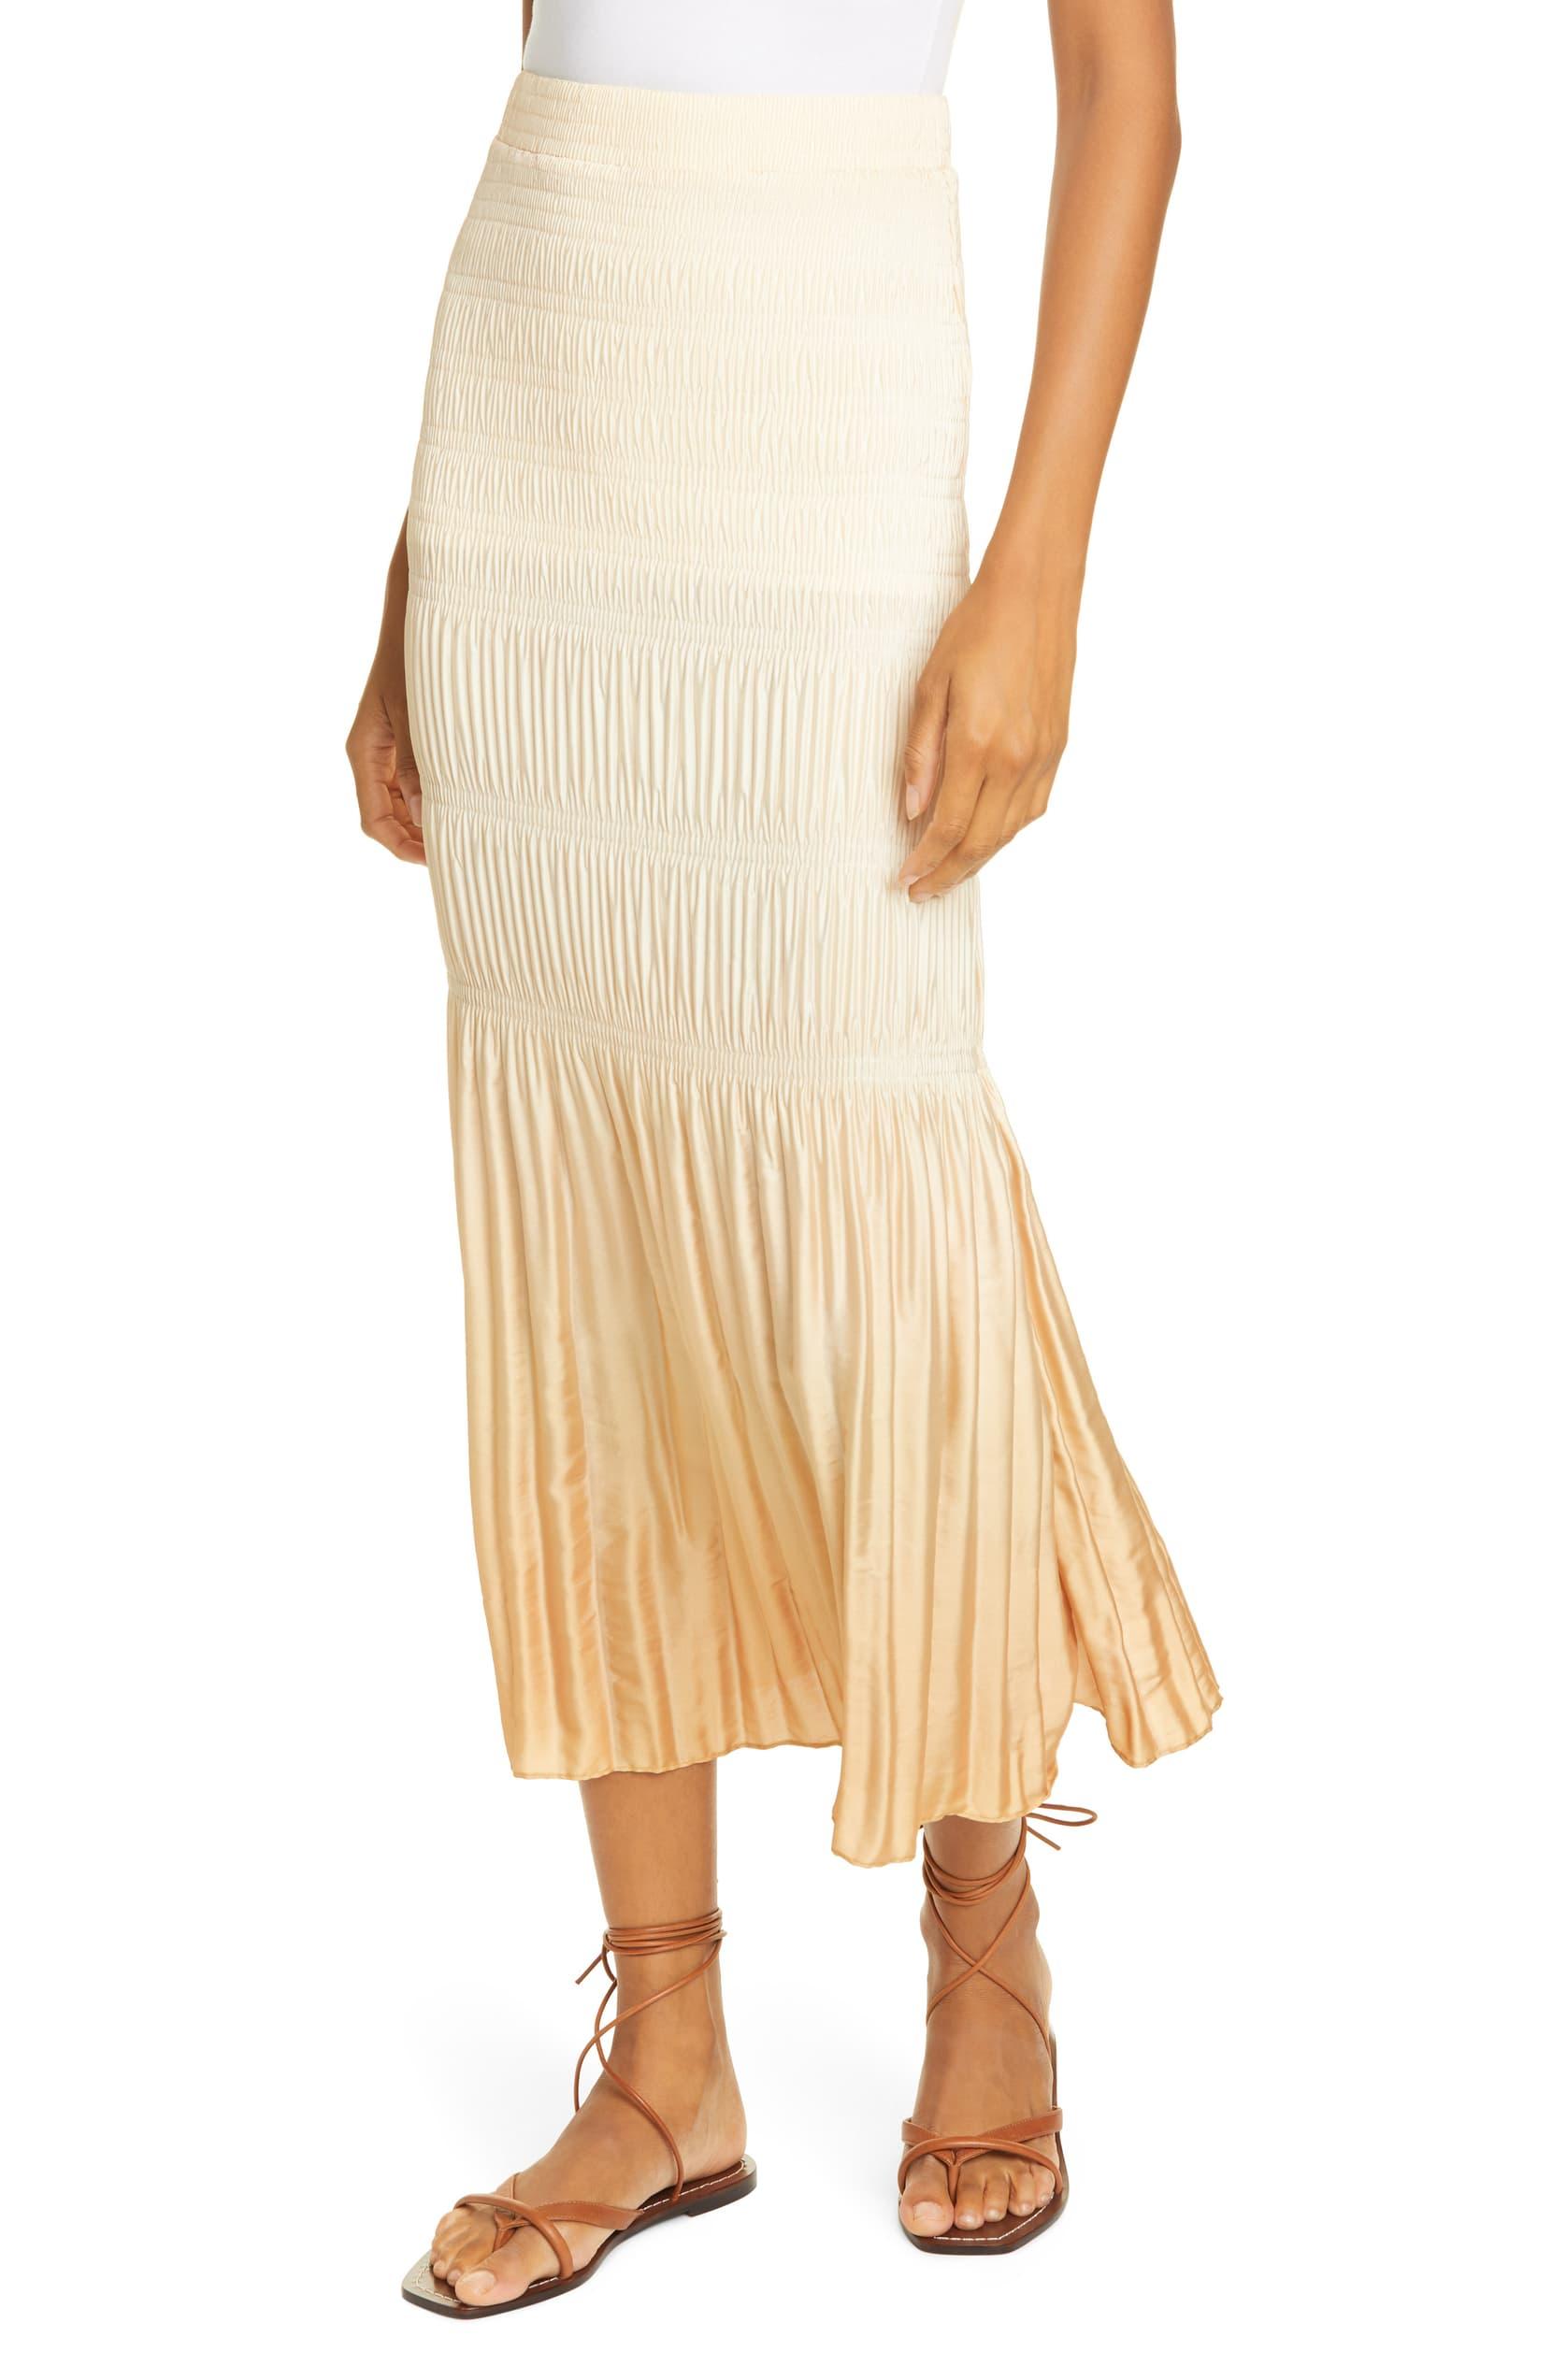 Joan Dip Dye Smocked Midi Skirt